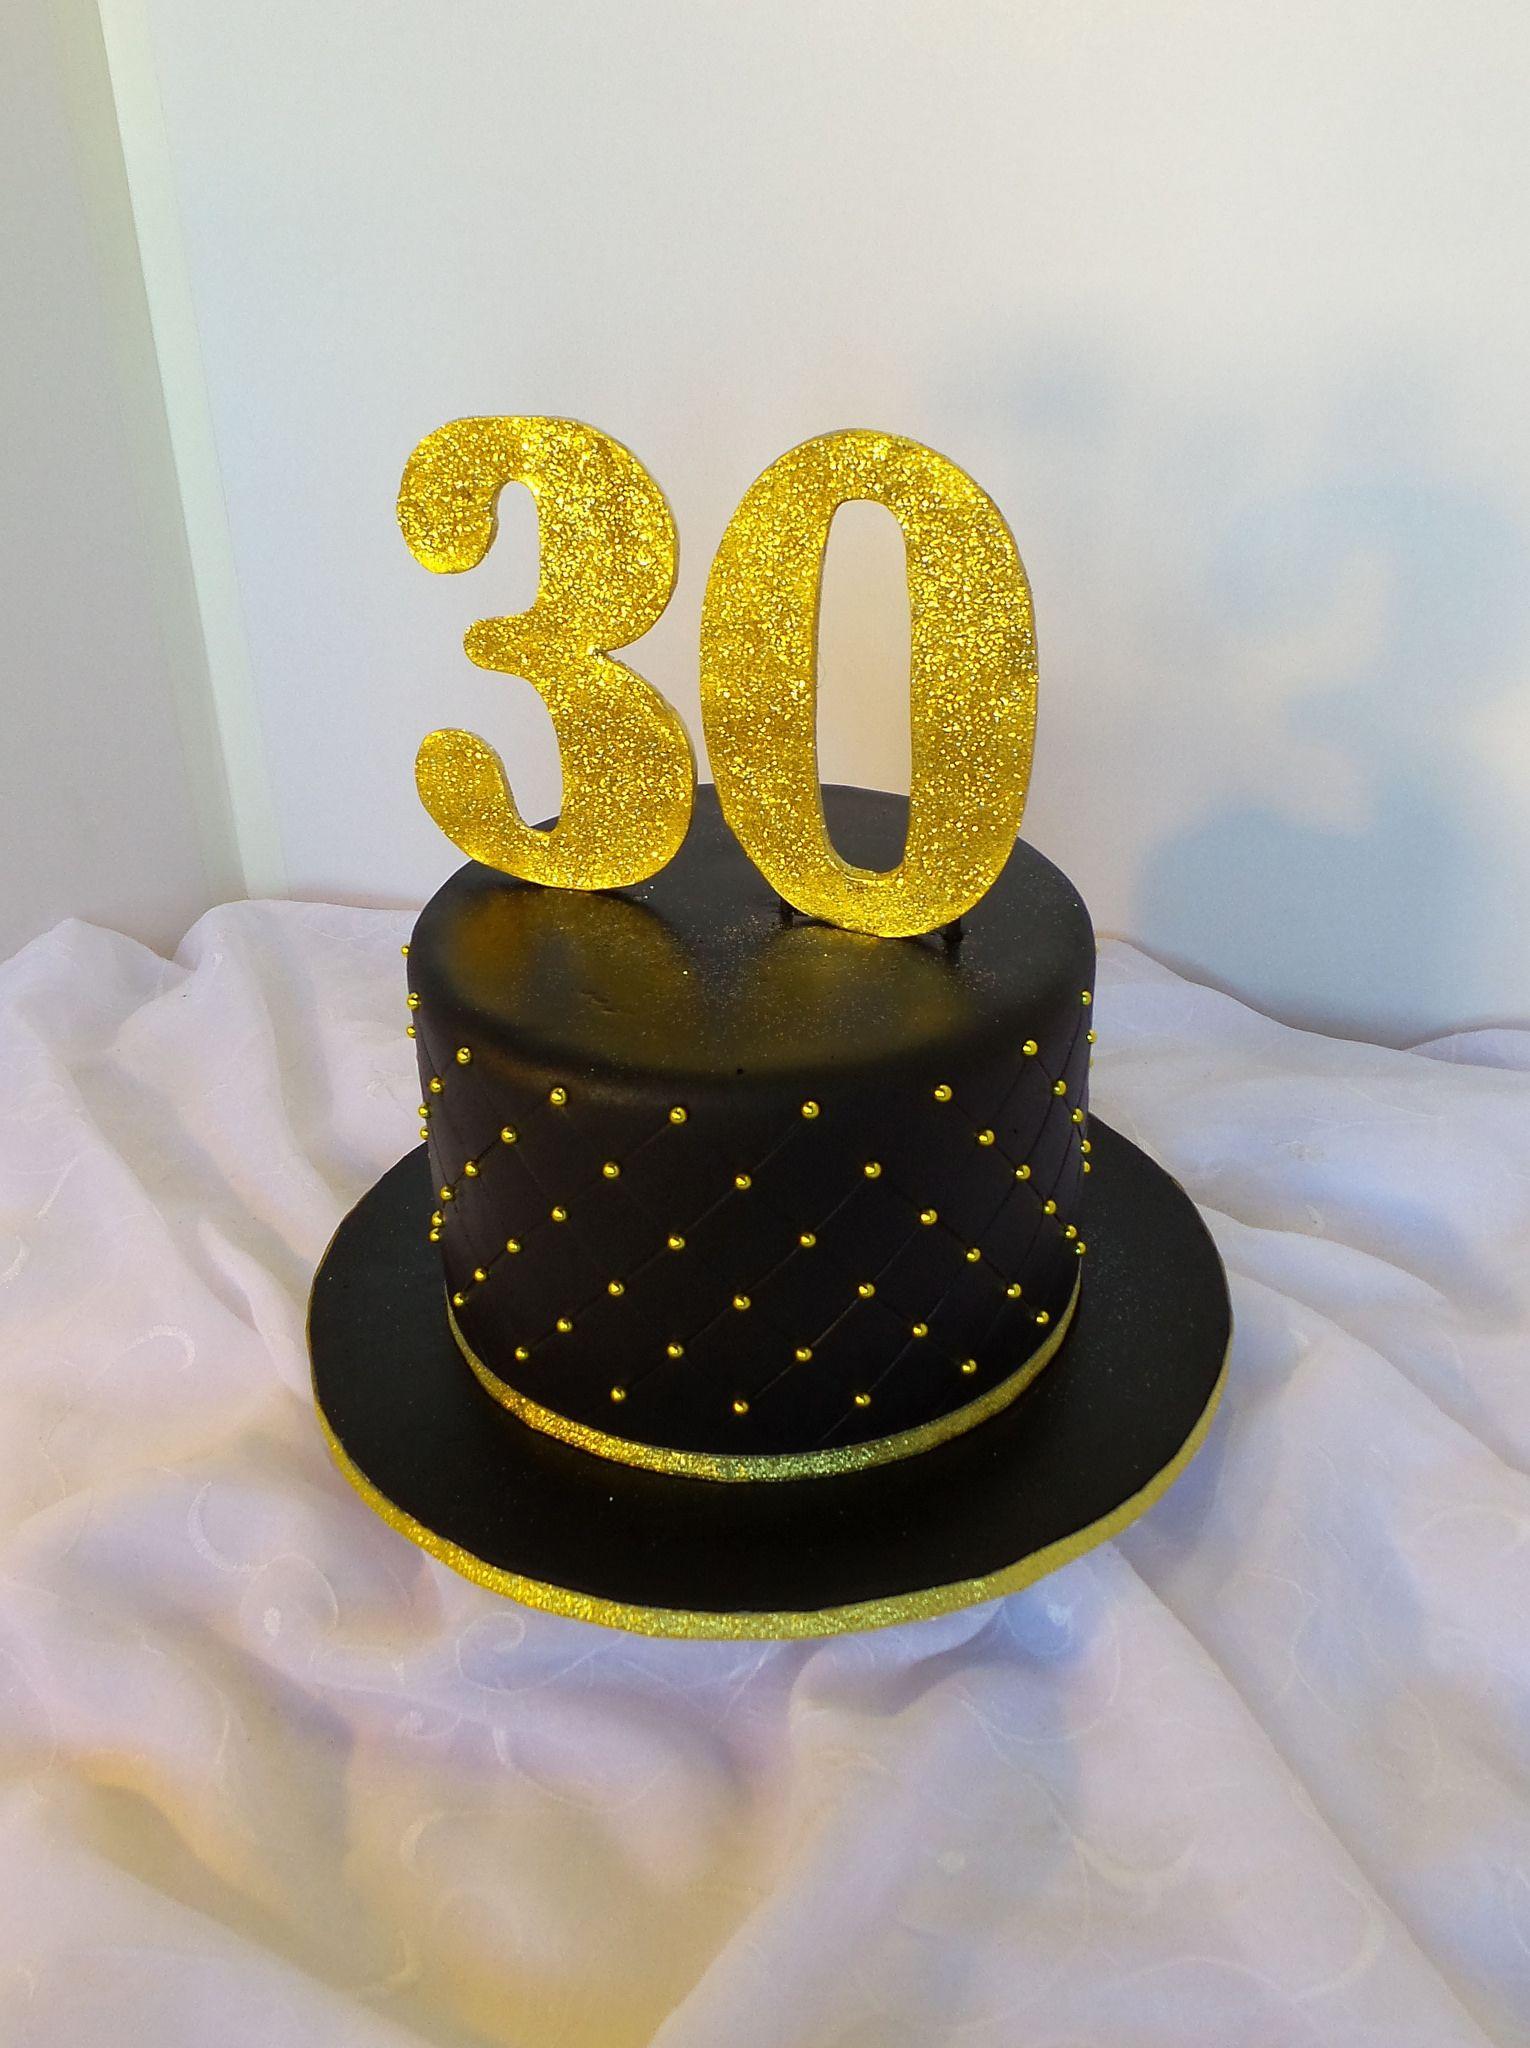 Black And Gold 30th Birthday Cake Black And Gold Birthday Cake